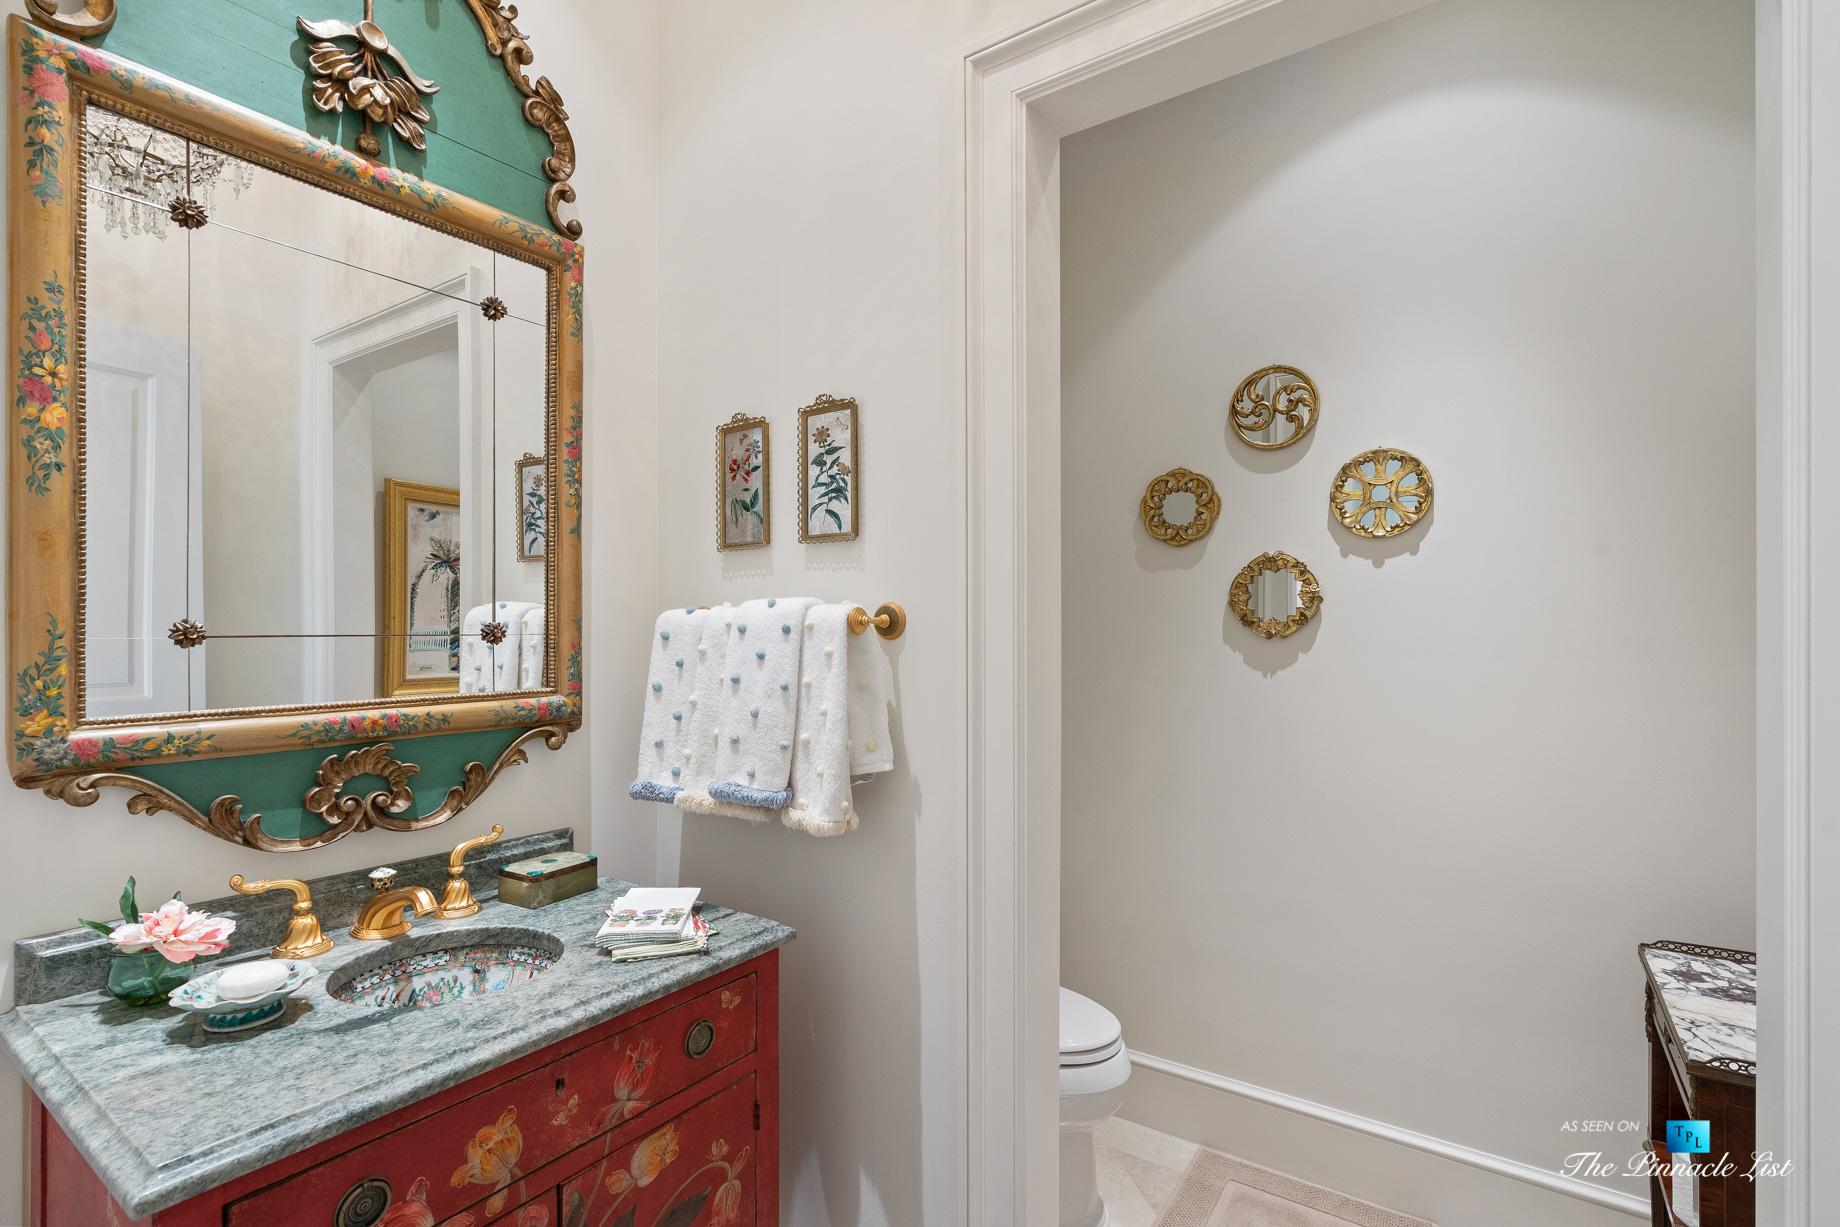 439 Blackland Rd NW, Atlanta, GA, USA - Washroom - Luxury Real Estate - Tuxedo Park Mediterranean Mansion Home